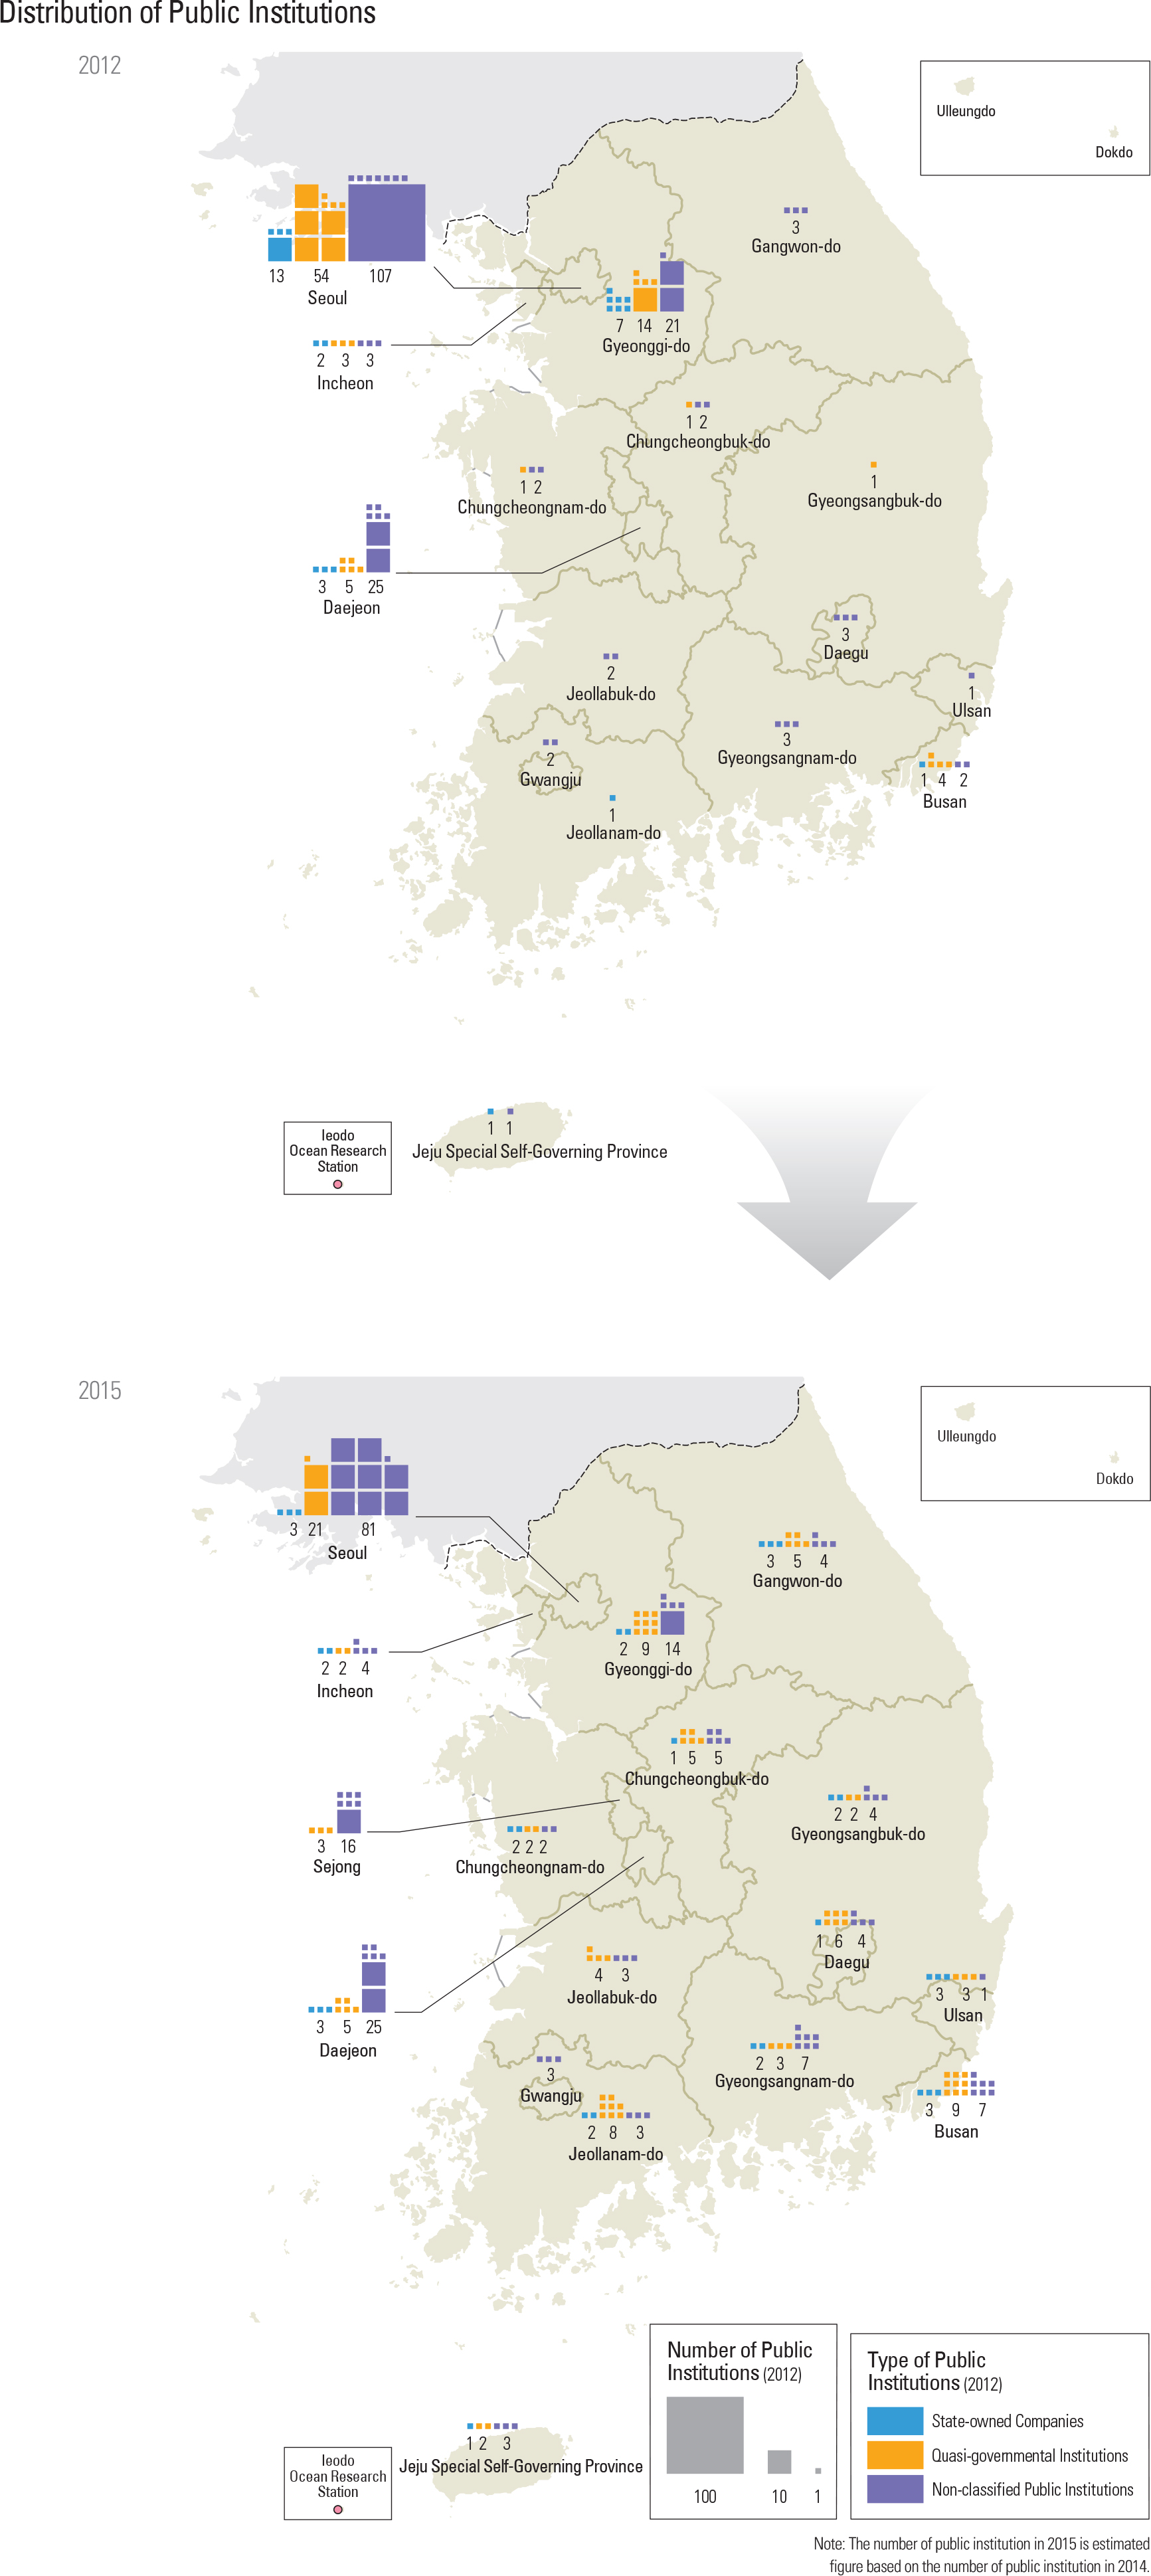 Distribution of Public Institutions